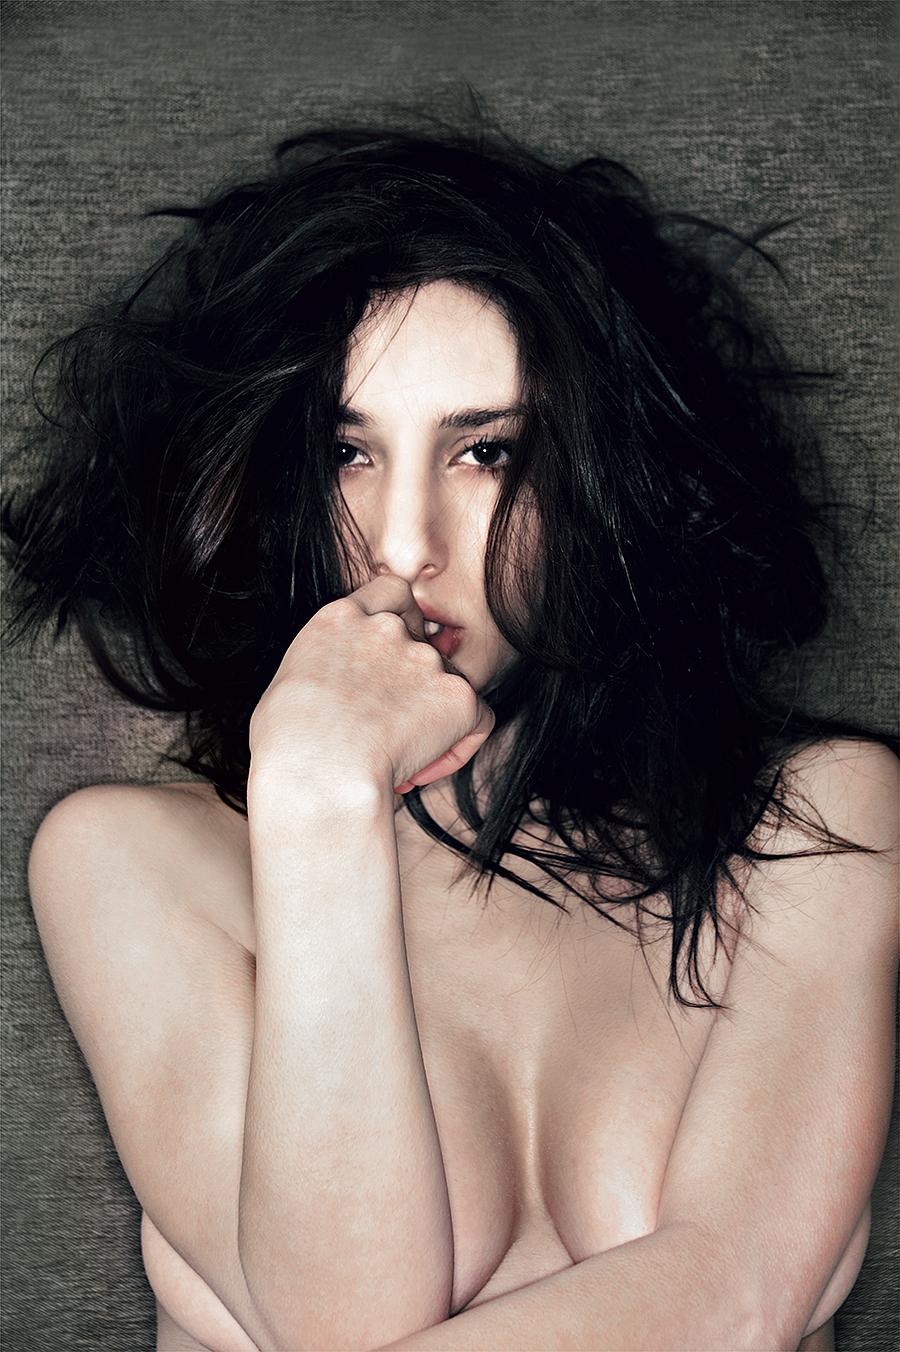 Tony_Ward_Studio_fashion_photography_Model_isabella_Reneaux_nudes_nudity_erotica_fashion_lingerie_unshaven_portrait_topless